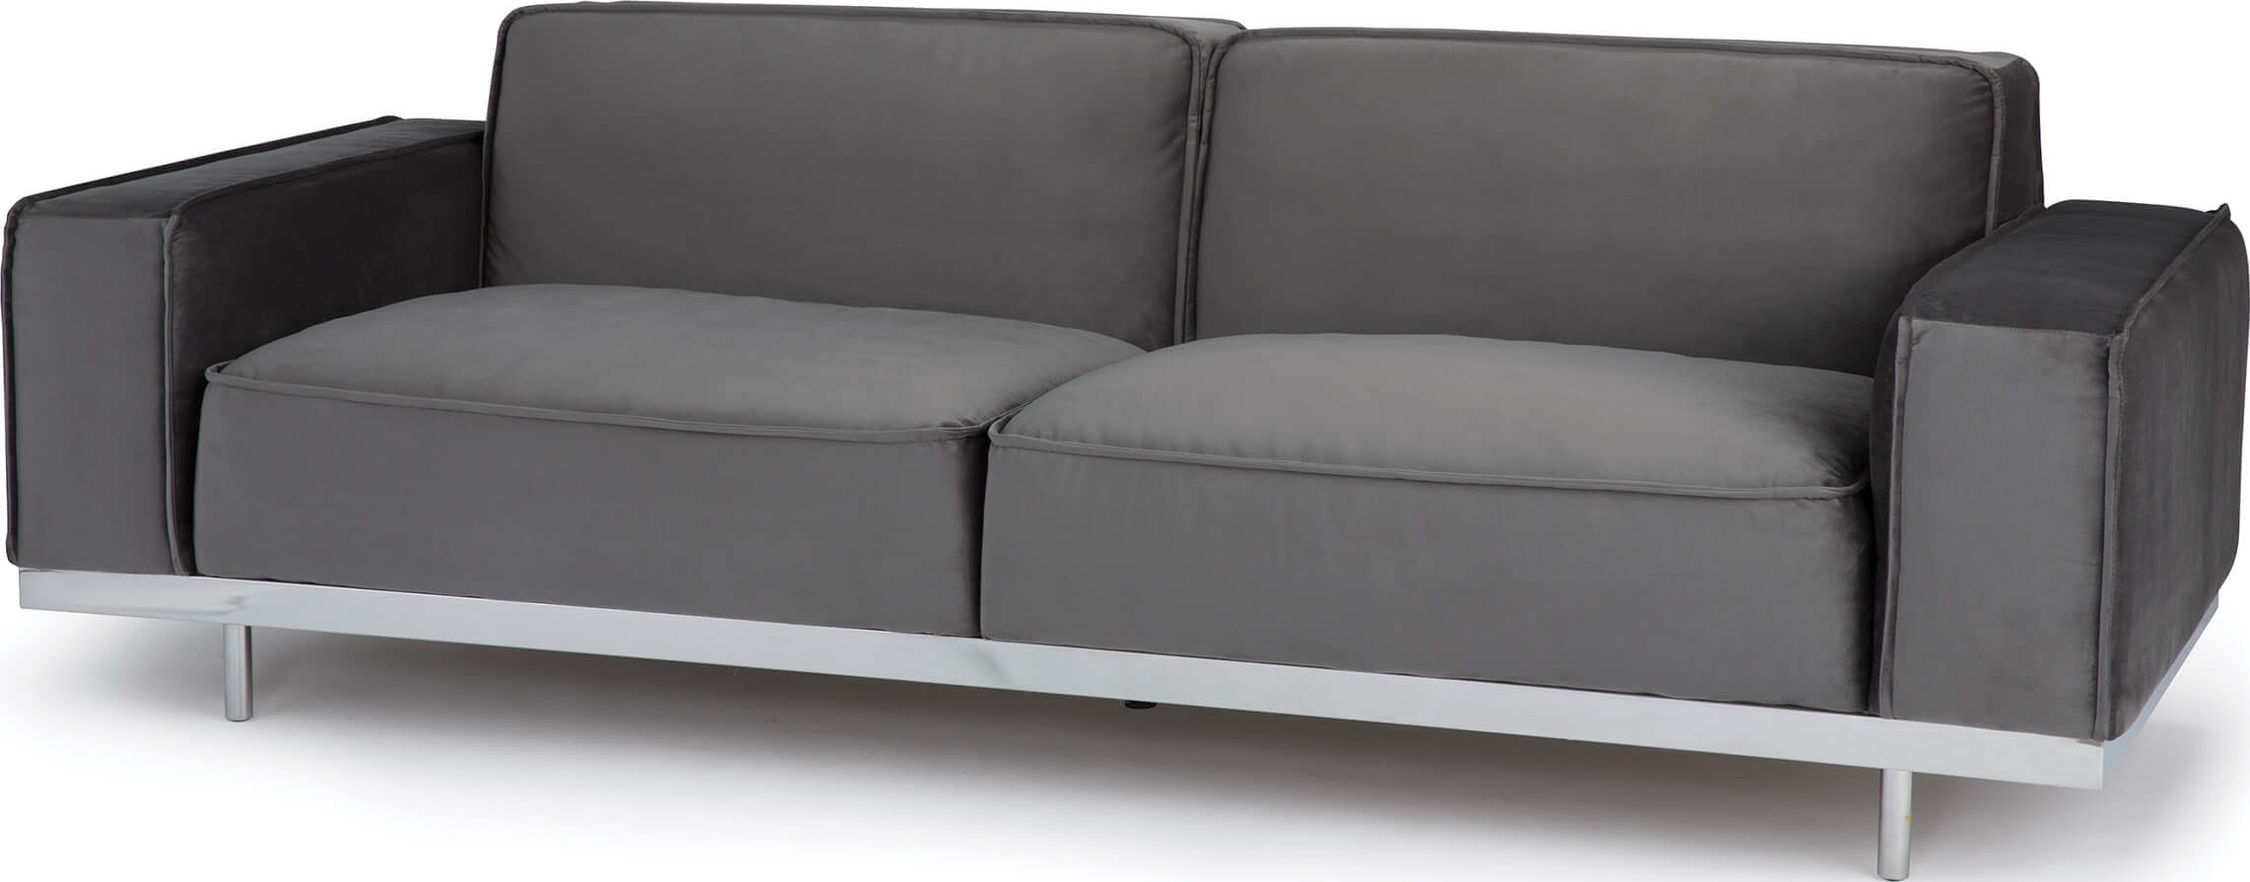 sabrina sofa clei doc xl bunk bed for sale velvet hedgeapple